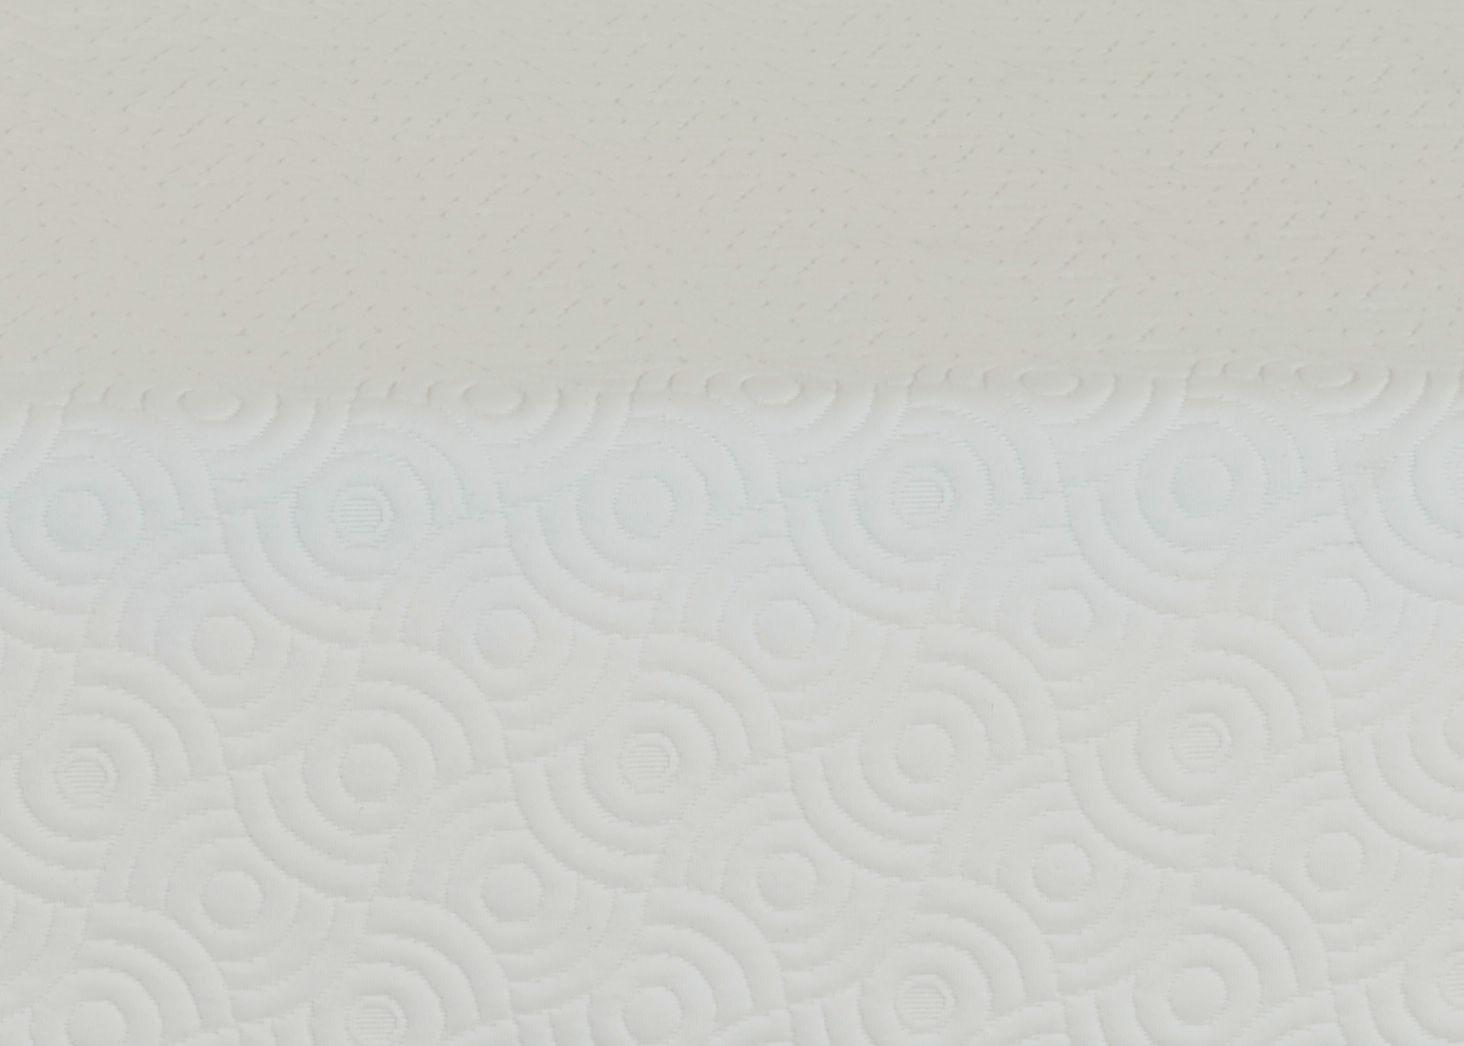 Enso Sleep Systems Mattresses Allure Mattress Image